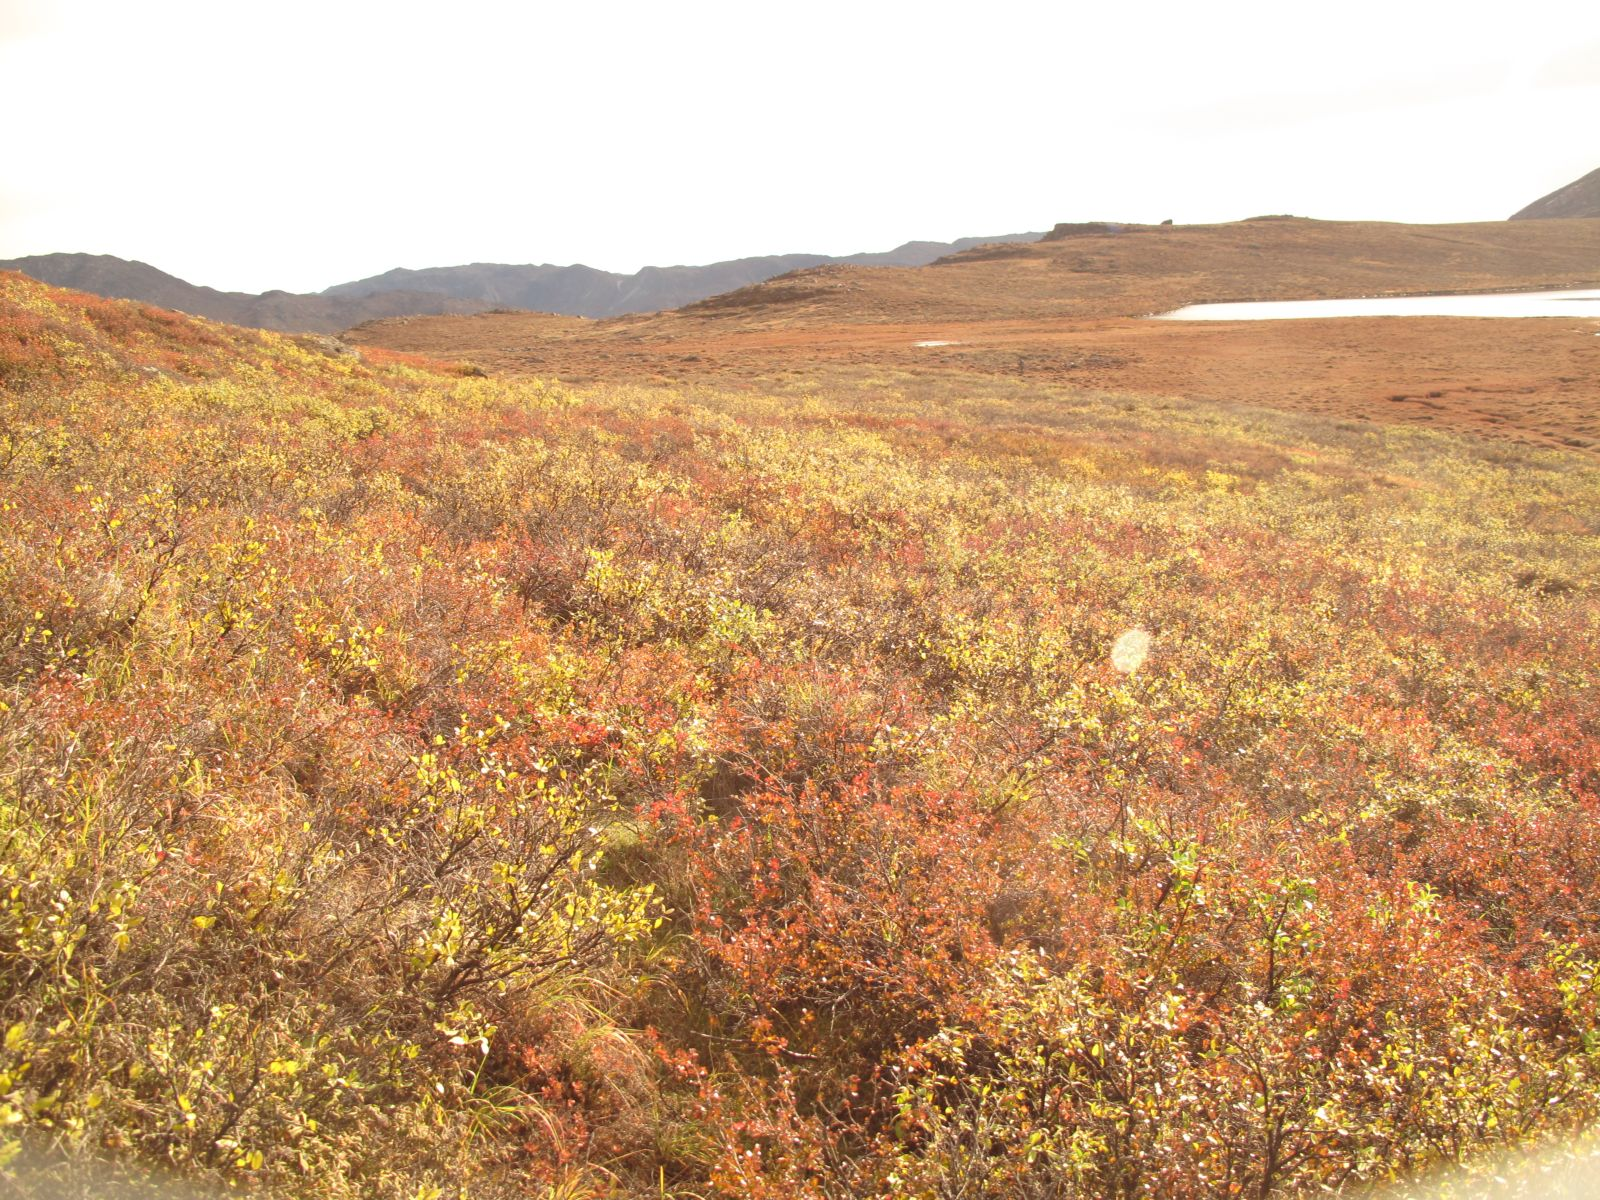 2010-09-25-1135_-_Terræn; Vegetation_2